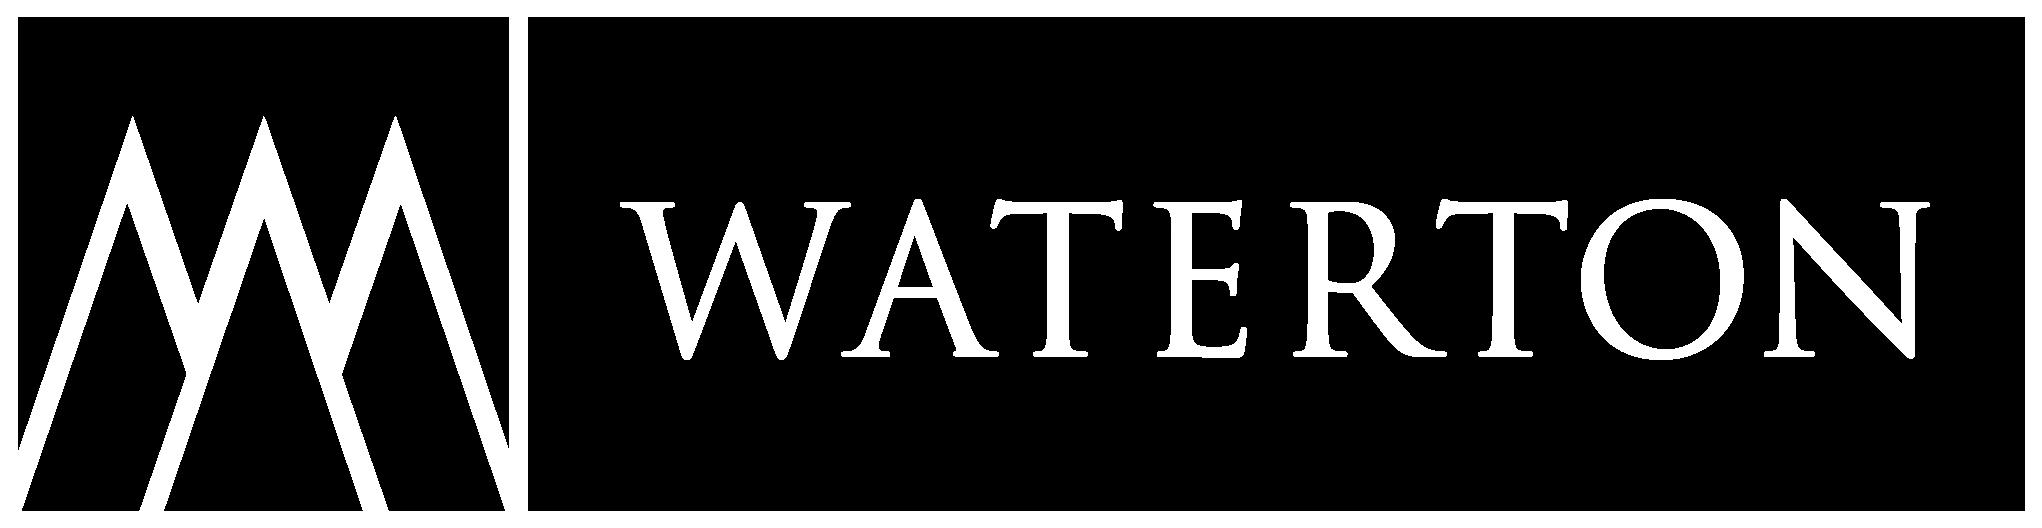 Retreat at McAlpine Logo | Retreat at McAlpine Creek Apartments in Charlotte, NC